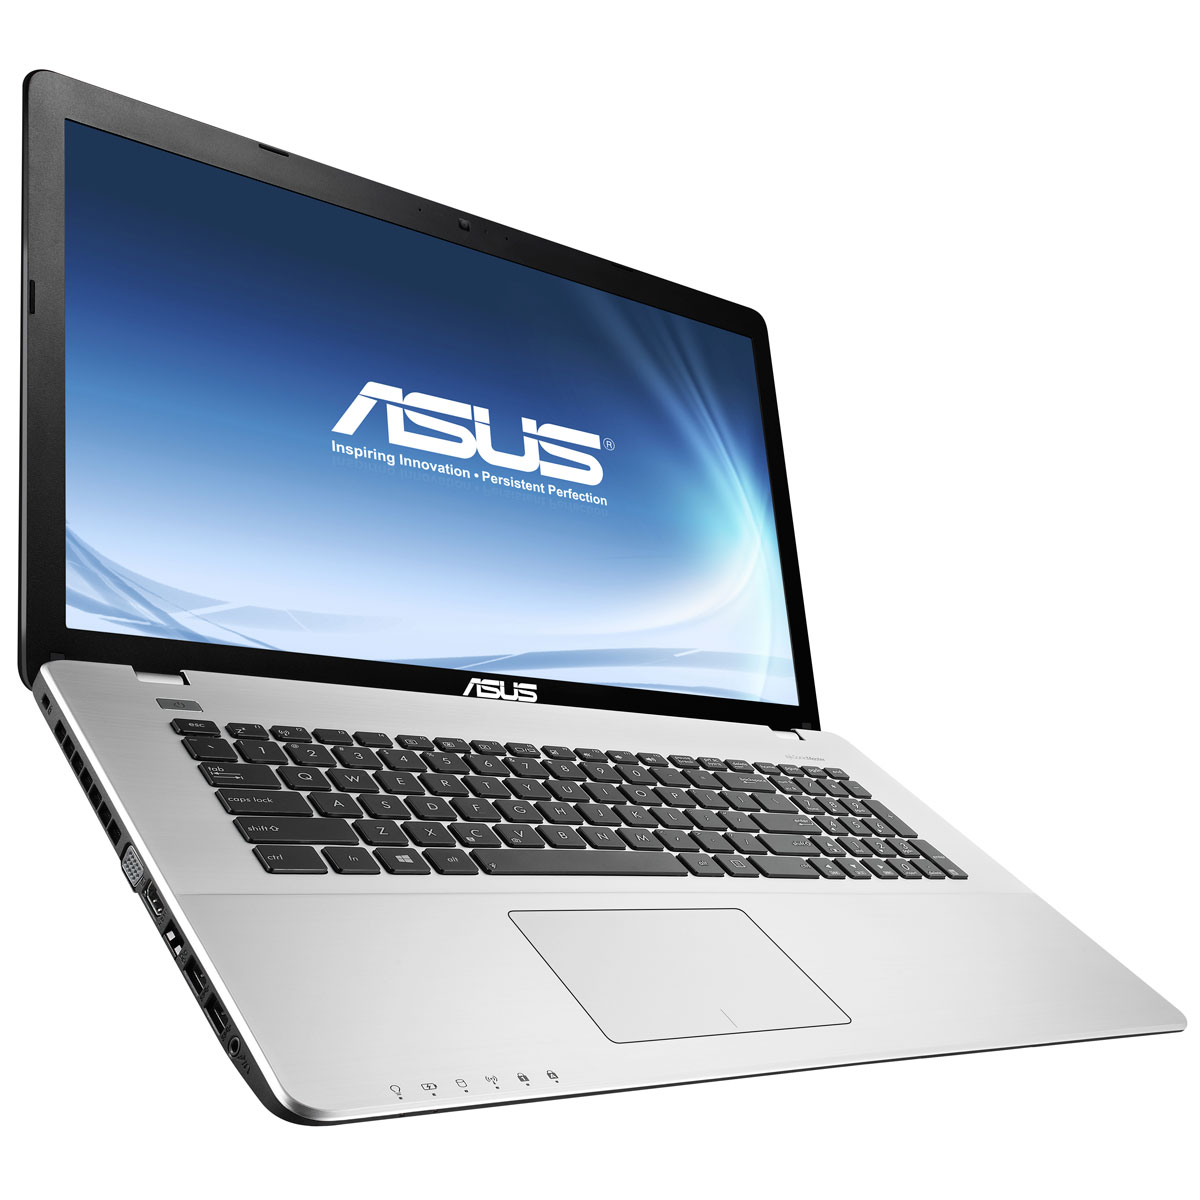 "PC portable ASUS R751LB-TY052H Intel Core i5-4200U 8 Go 1 To 17.3"" LED NVIDIA GeForce GT 740M Graveur DVD Wi-Fi N/Bluetooth Webcam Windows 8 64 bits (Garantie constructeur 1 an)"